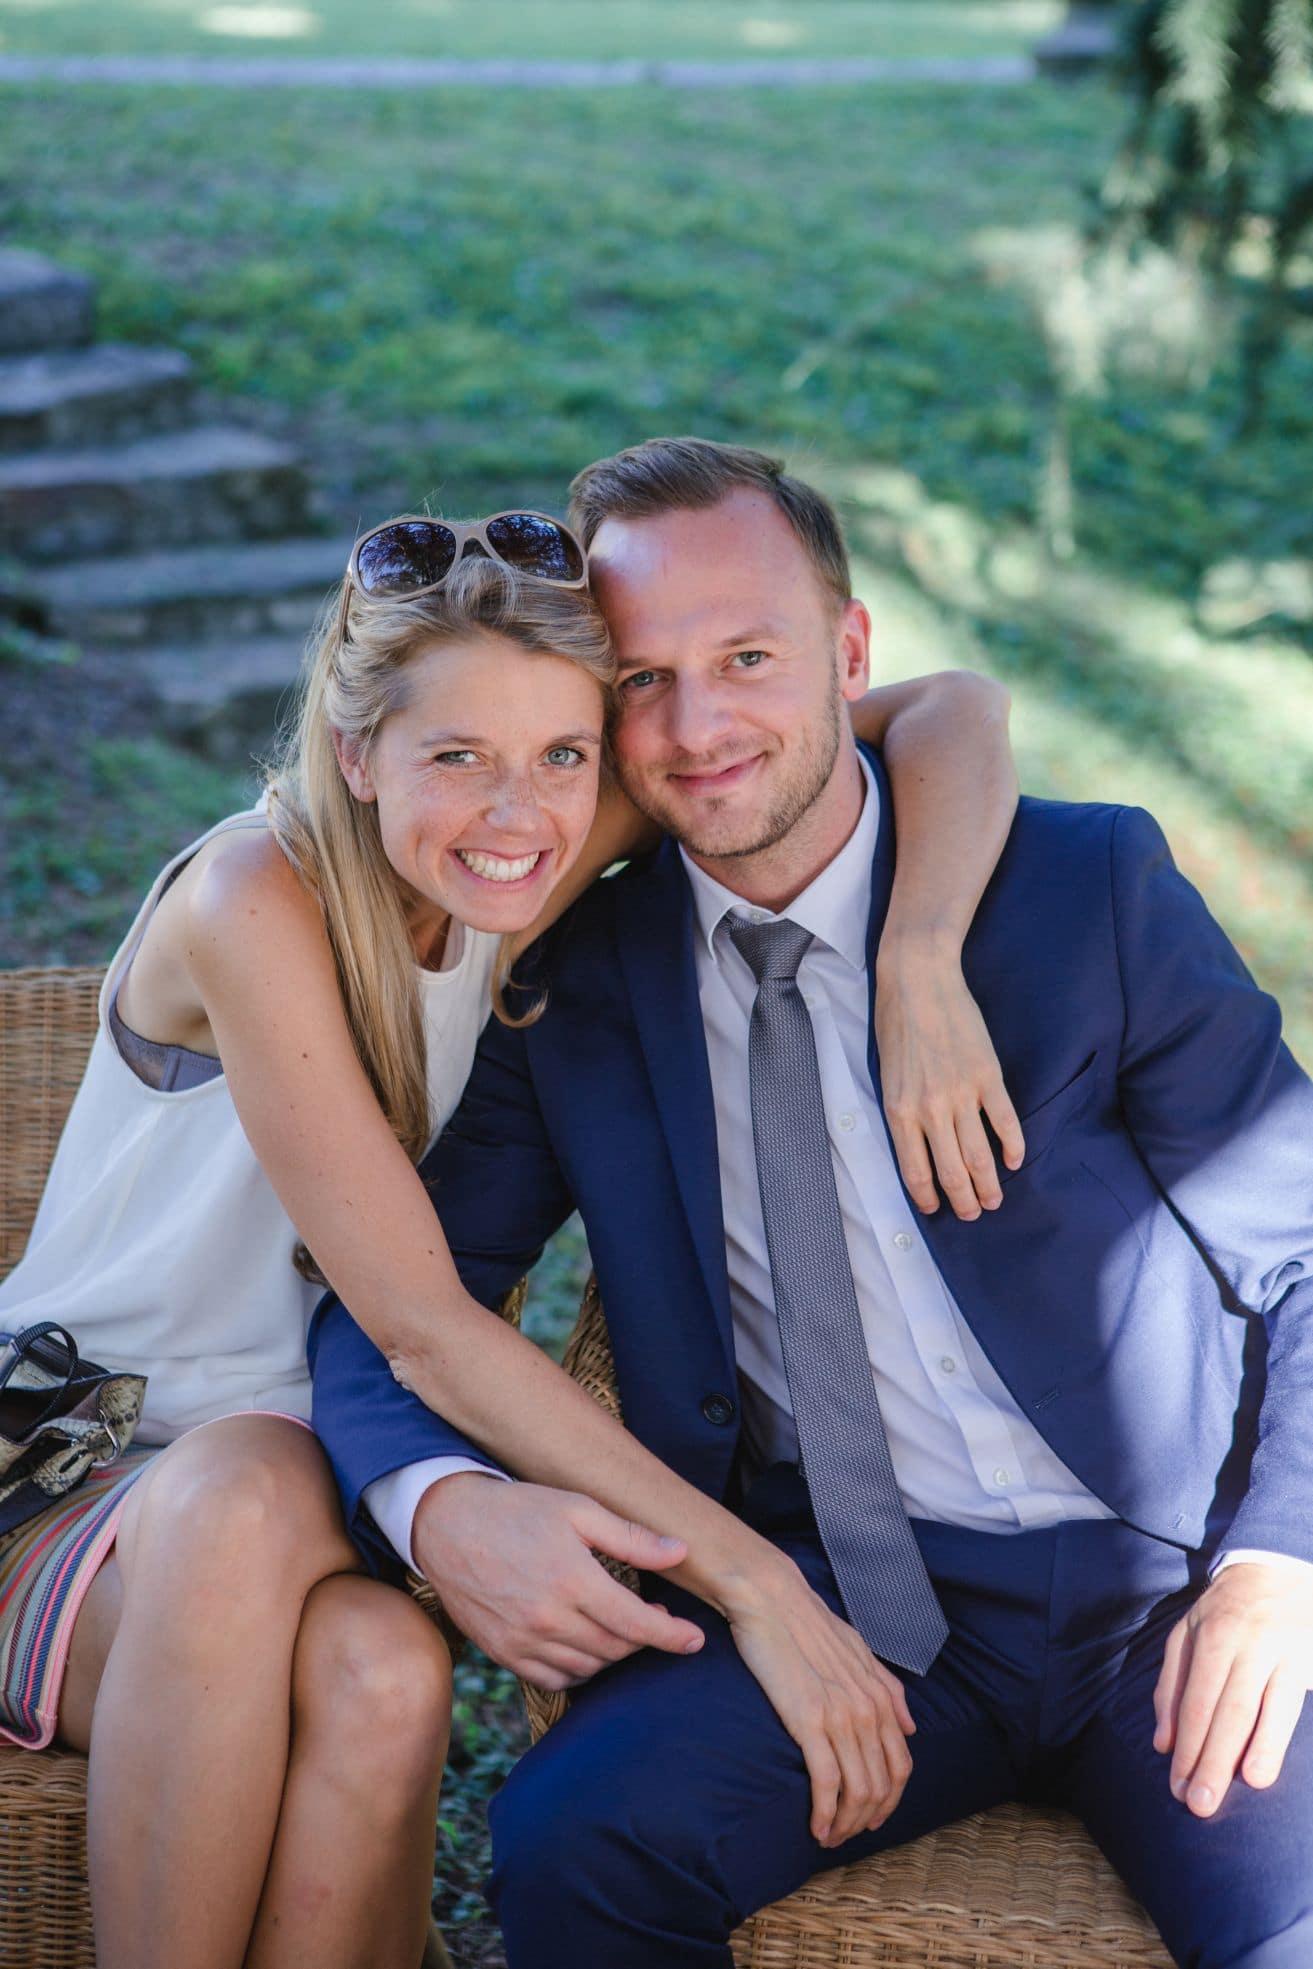 Million Memories_A&D_Hochzeitsfotograf_Schlosshochzeit_Toskana_Lago Di Como_Wedding_Tuscany_141